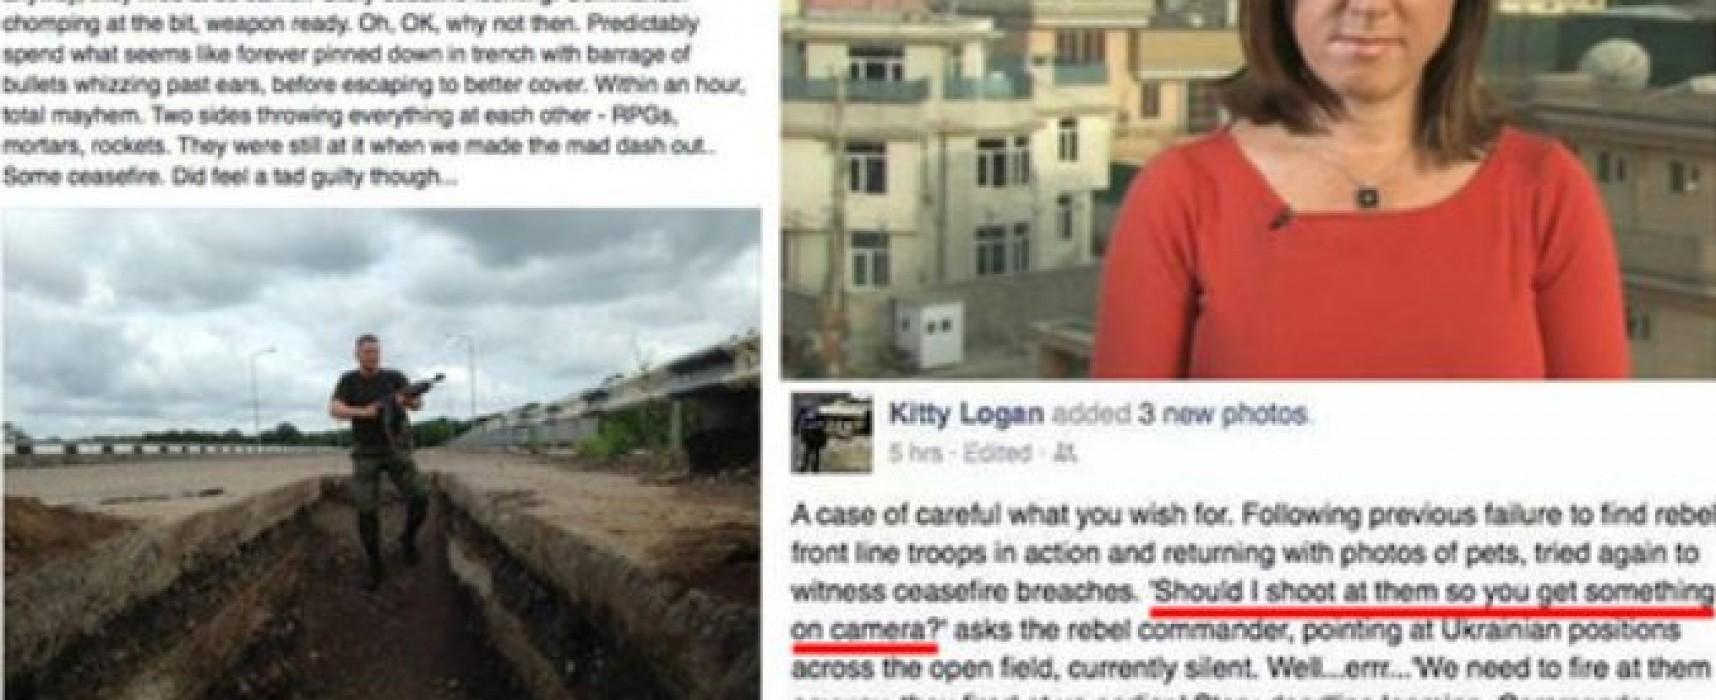 Former Deutsche Welle reporter Kitty Logan loses press accreditation in Ukraine